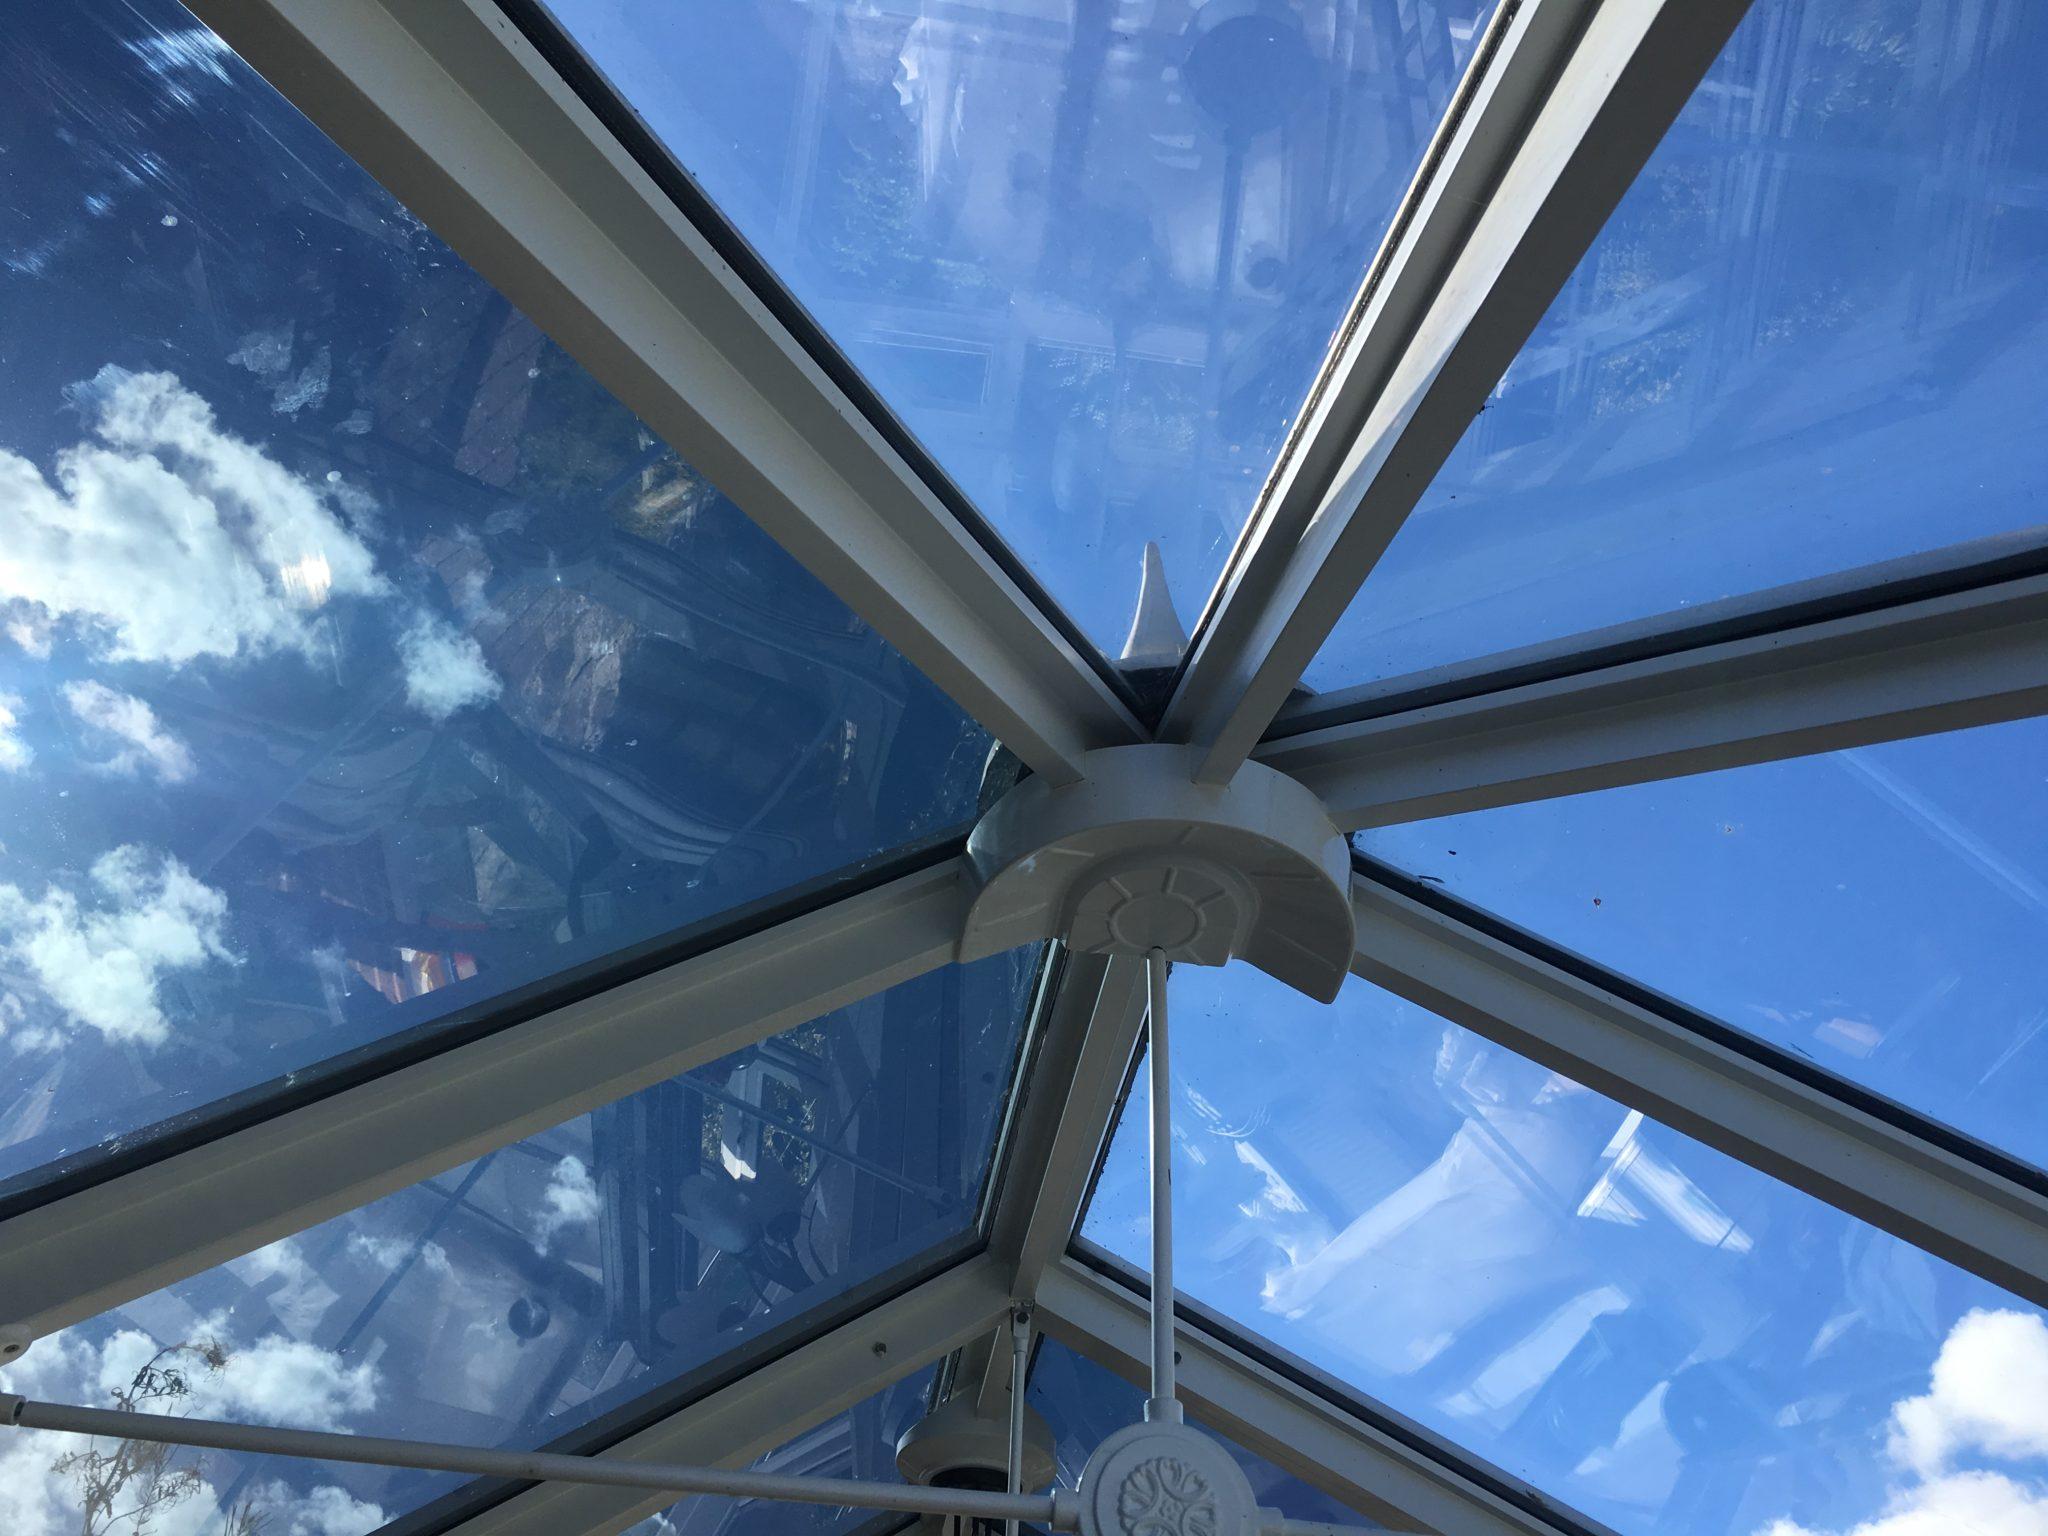 Conservatory Glare Reduction Visible Light Transmission 14%